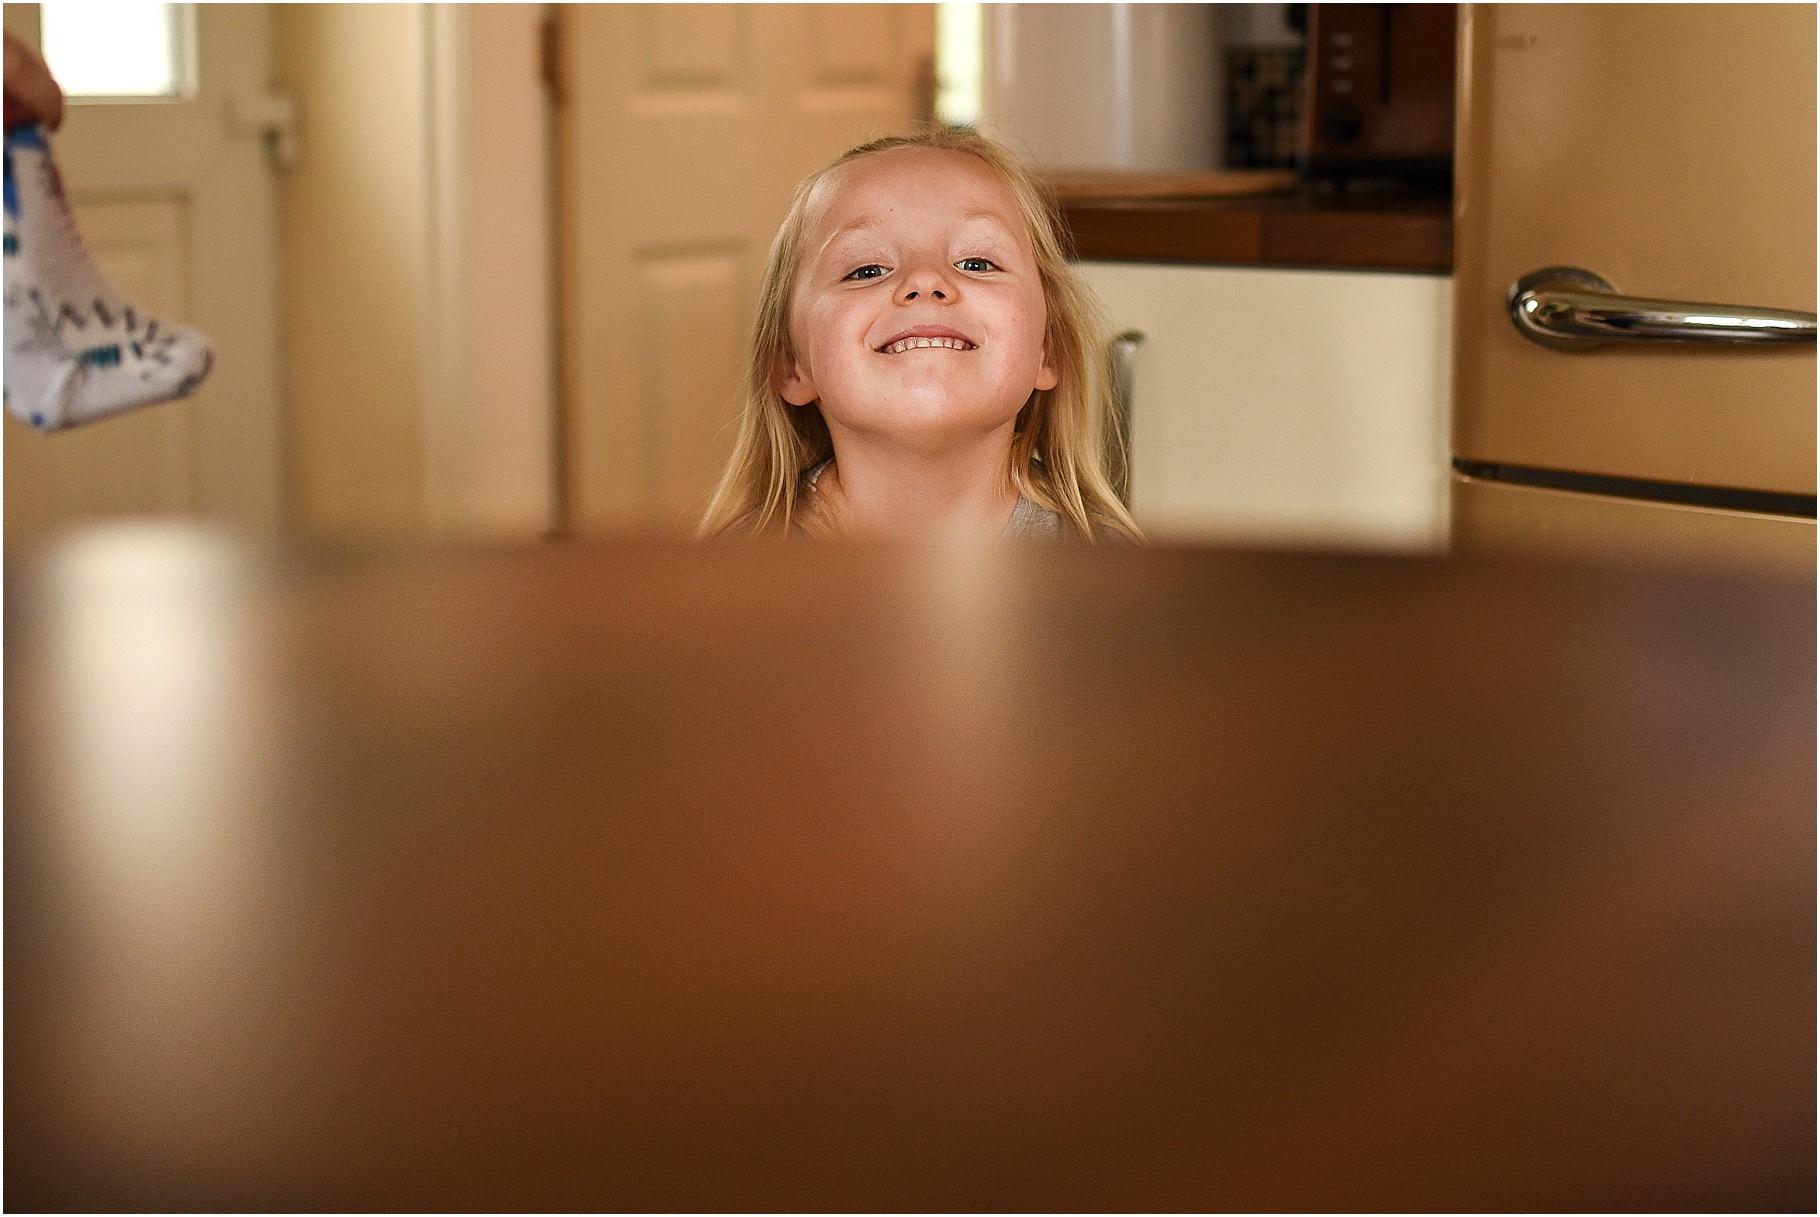 lancashire-family-portraits-documentary-newborn-06.jpg